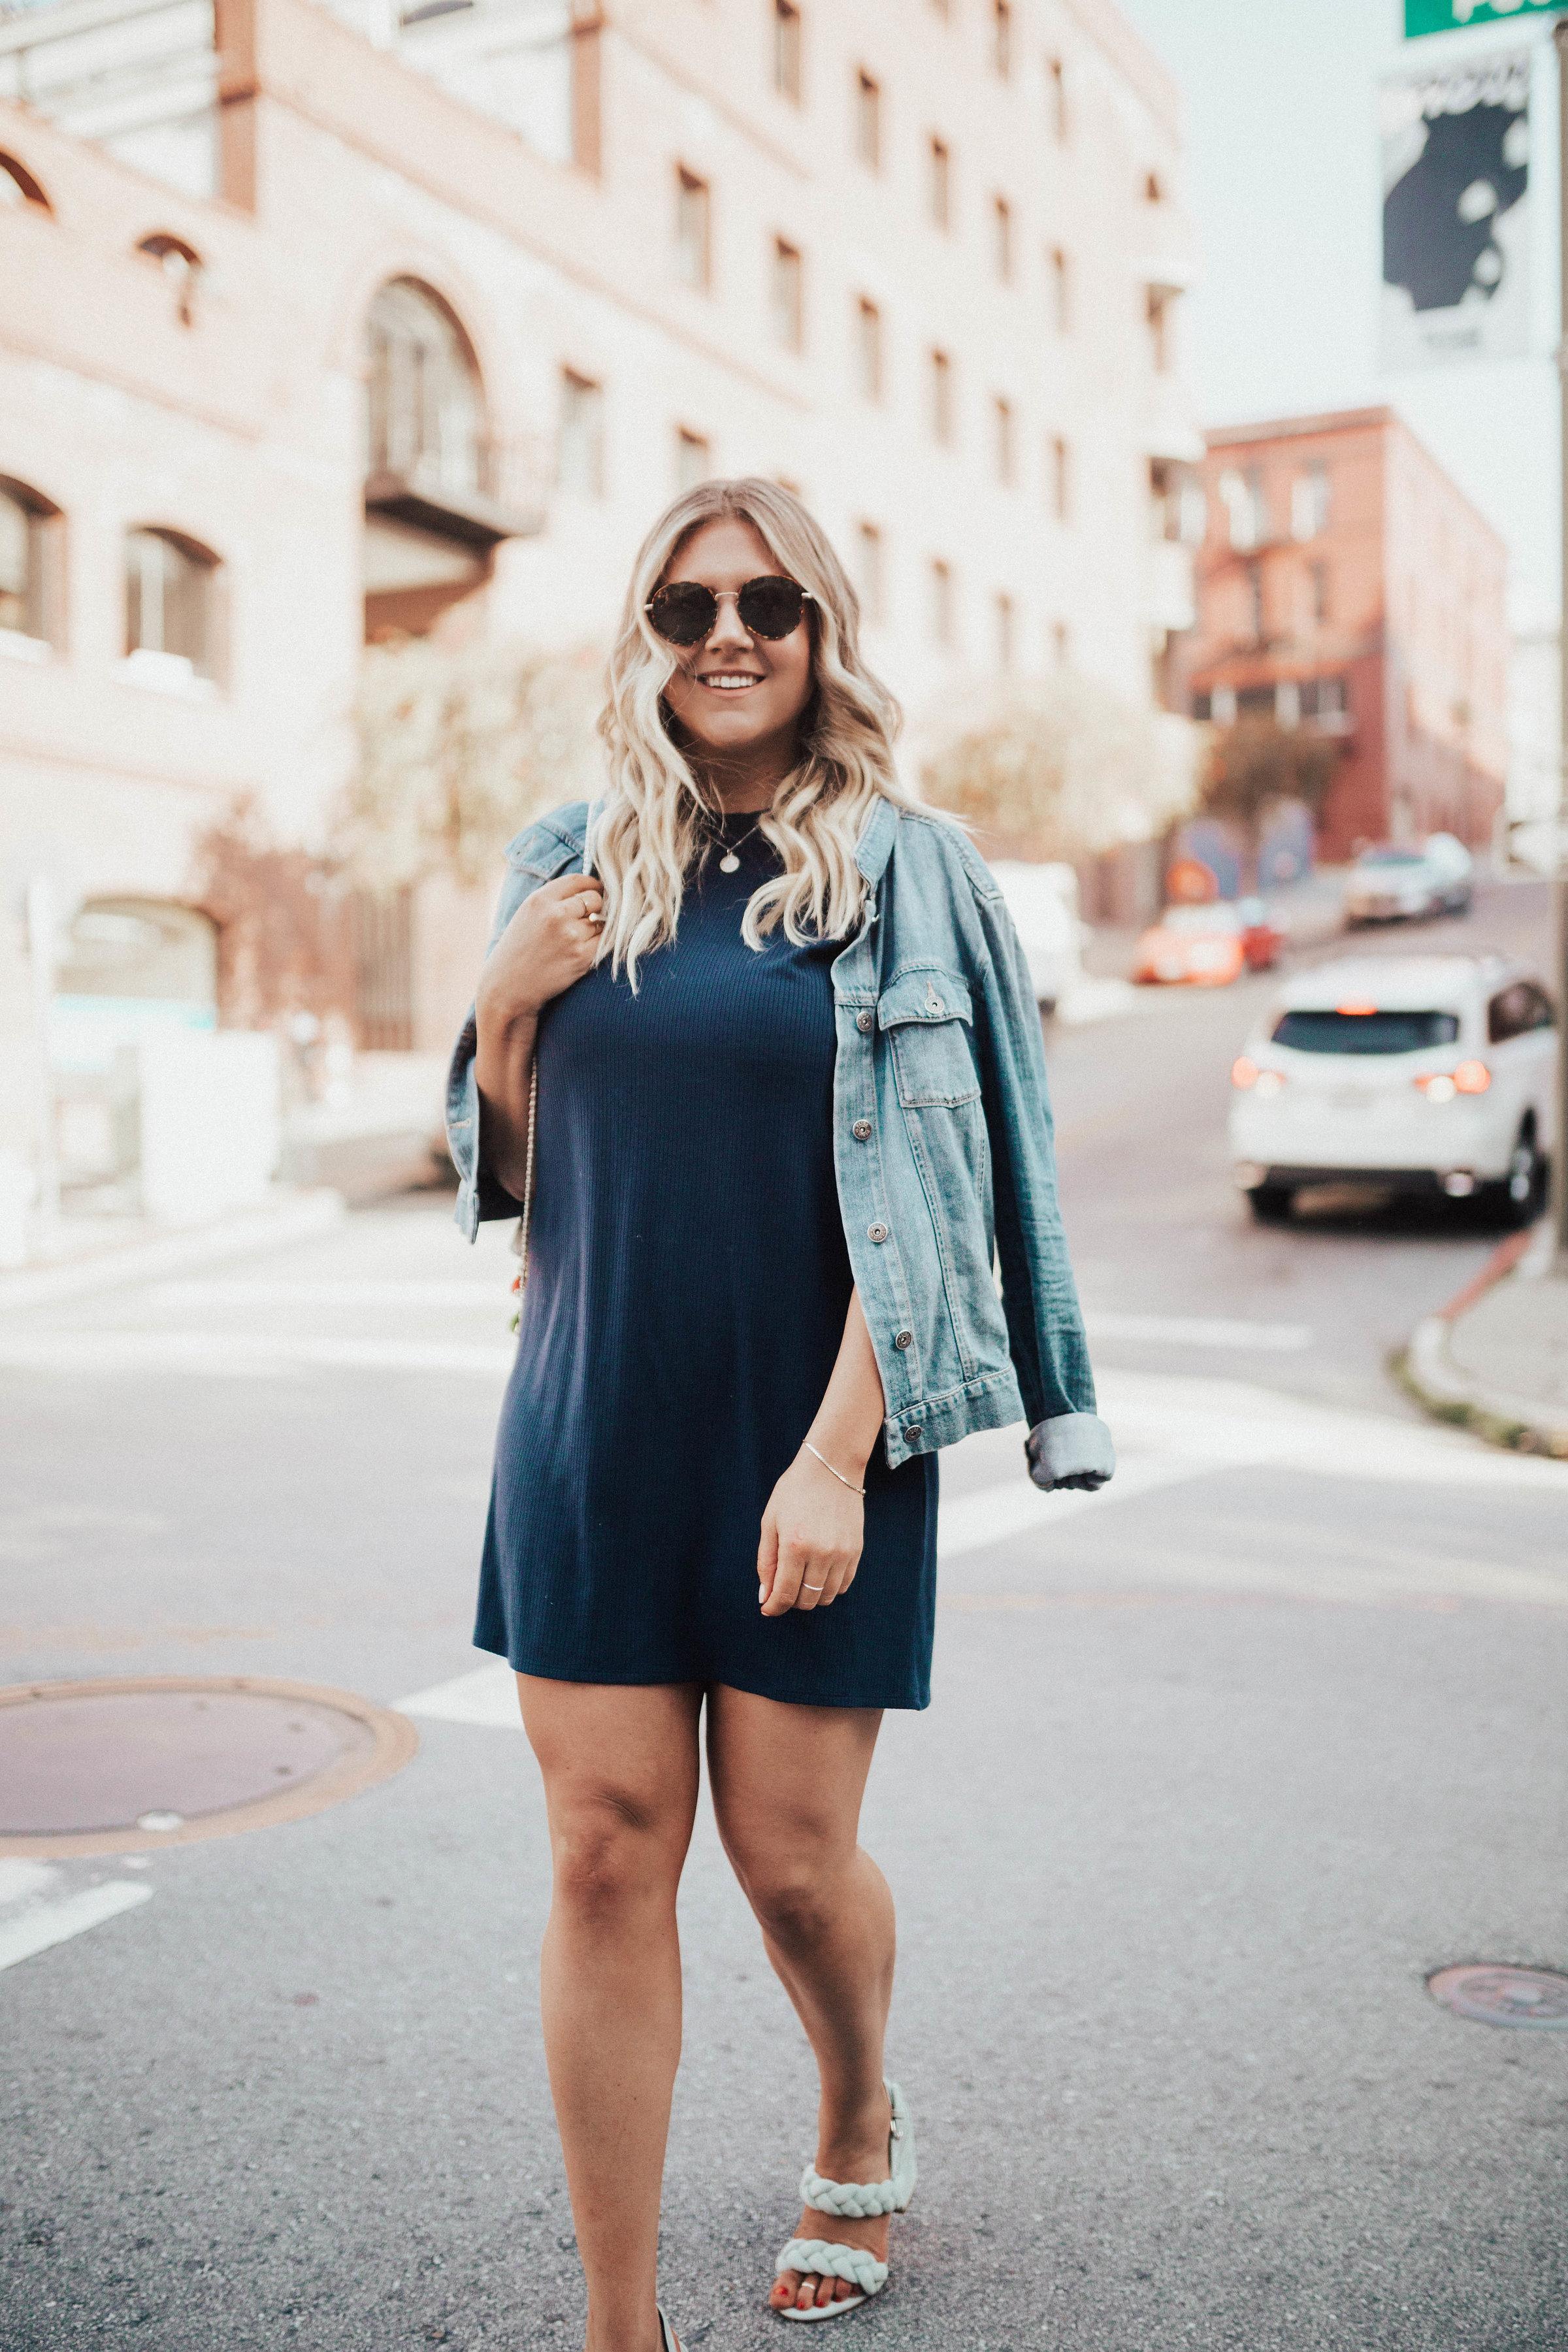 via Thea Reformation Dress, Paige Denim Jacket, Rebecca Minkoff Heels